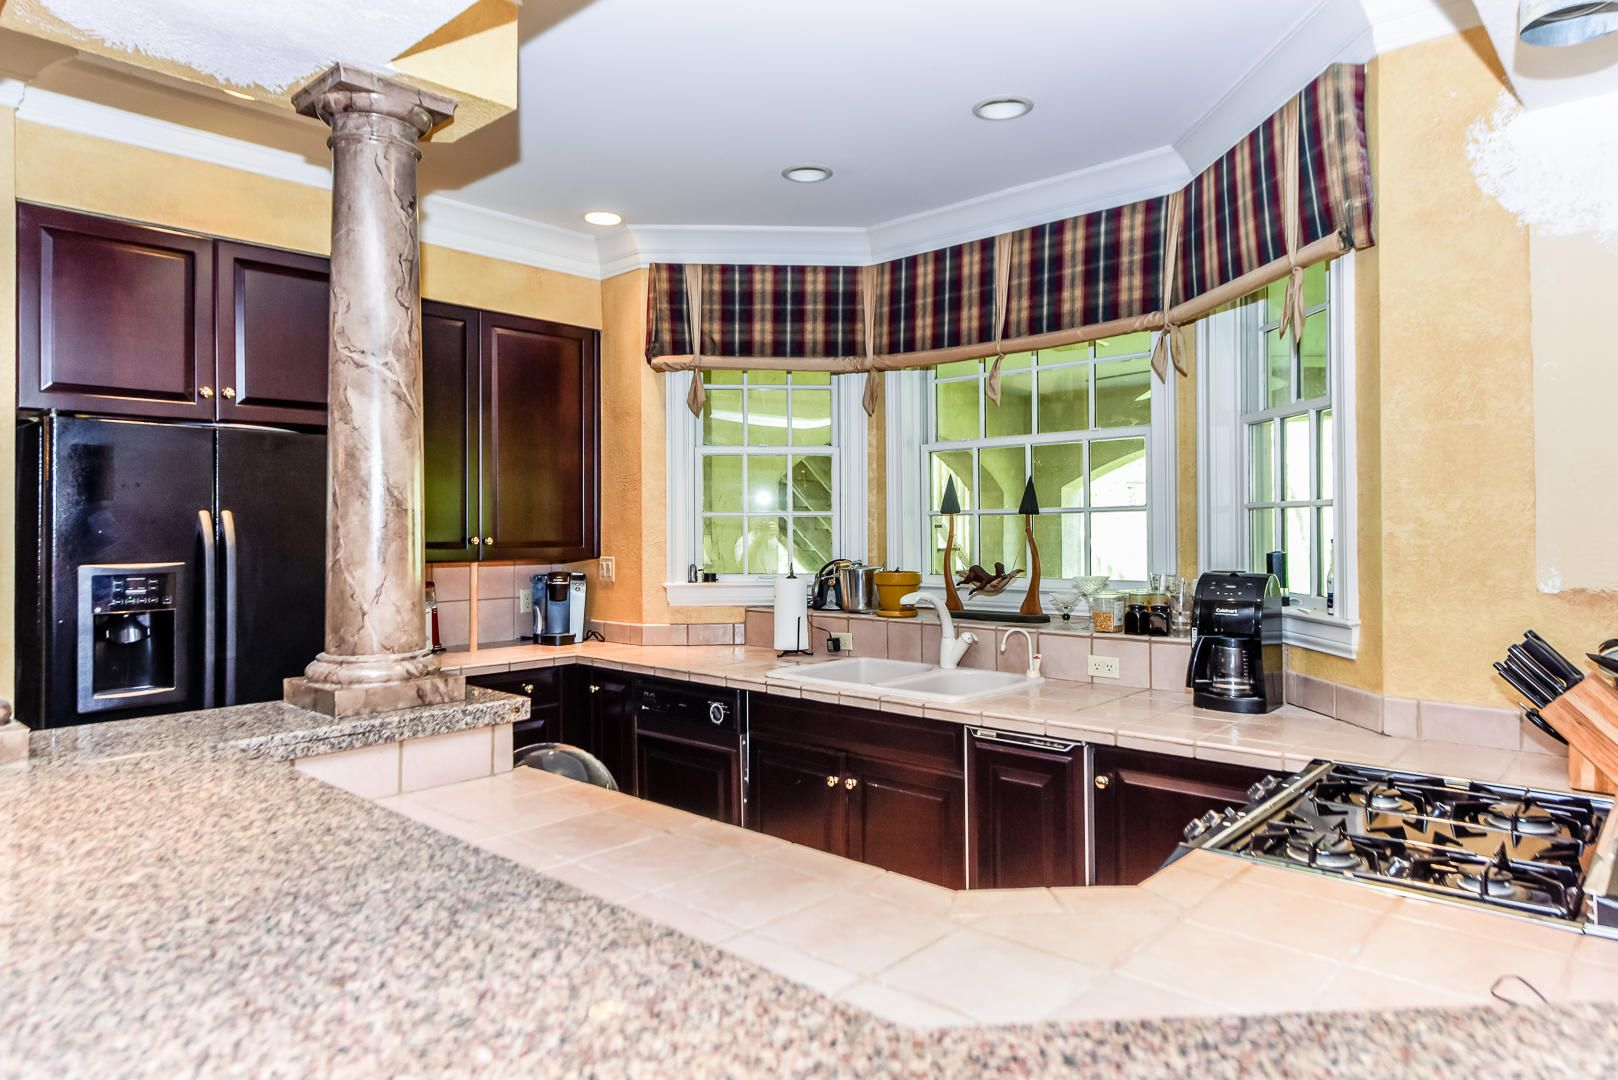 Full kitchen in basement